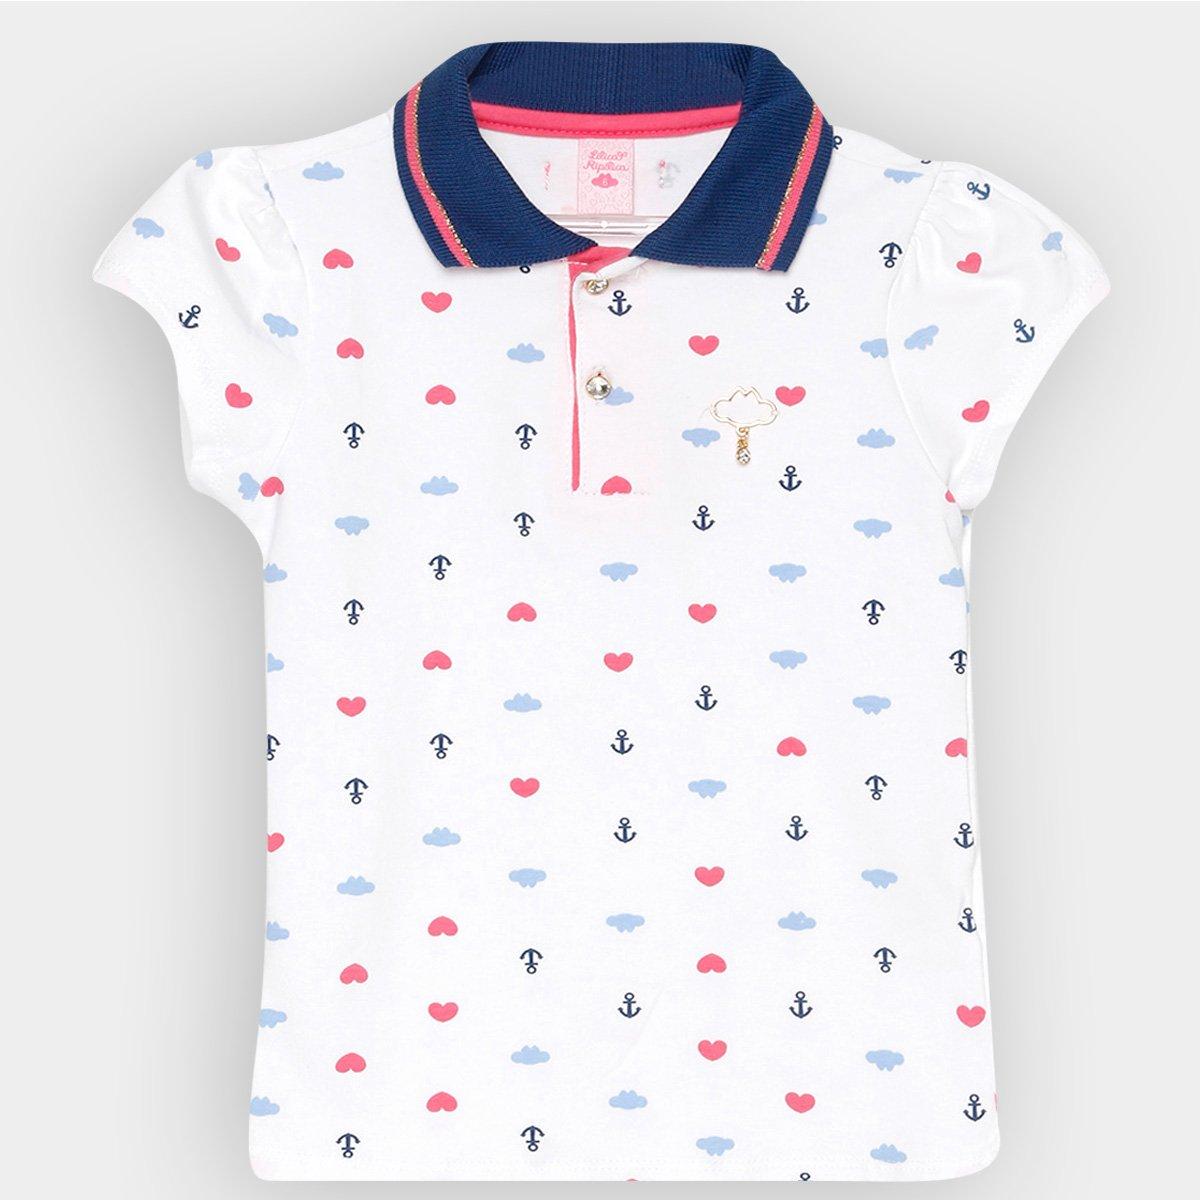 bc35f6f203f Camisa Polo Infantil Lilica Ripilica Estampada Feminina - Branco - Compre  Agora